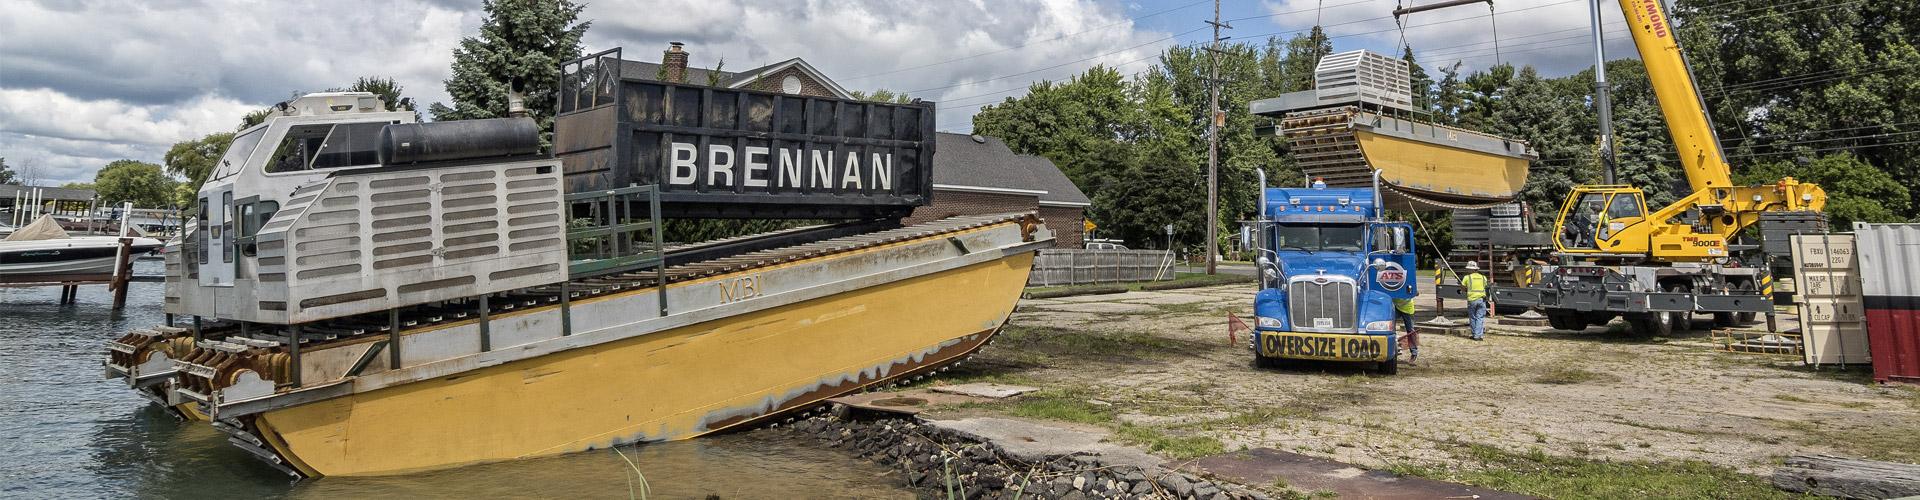 amphibious equipment, environmental remediation, remedial dredging